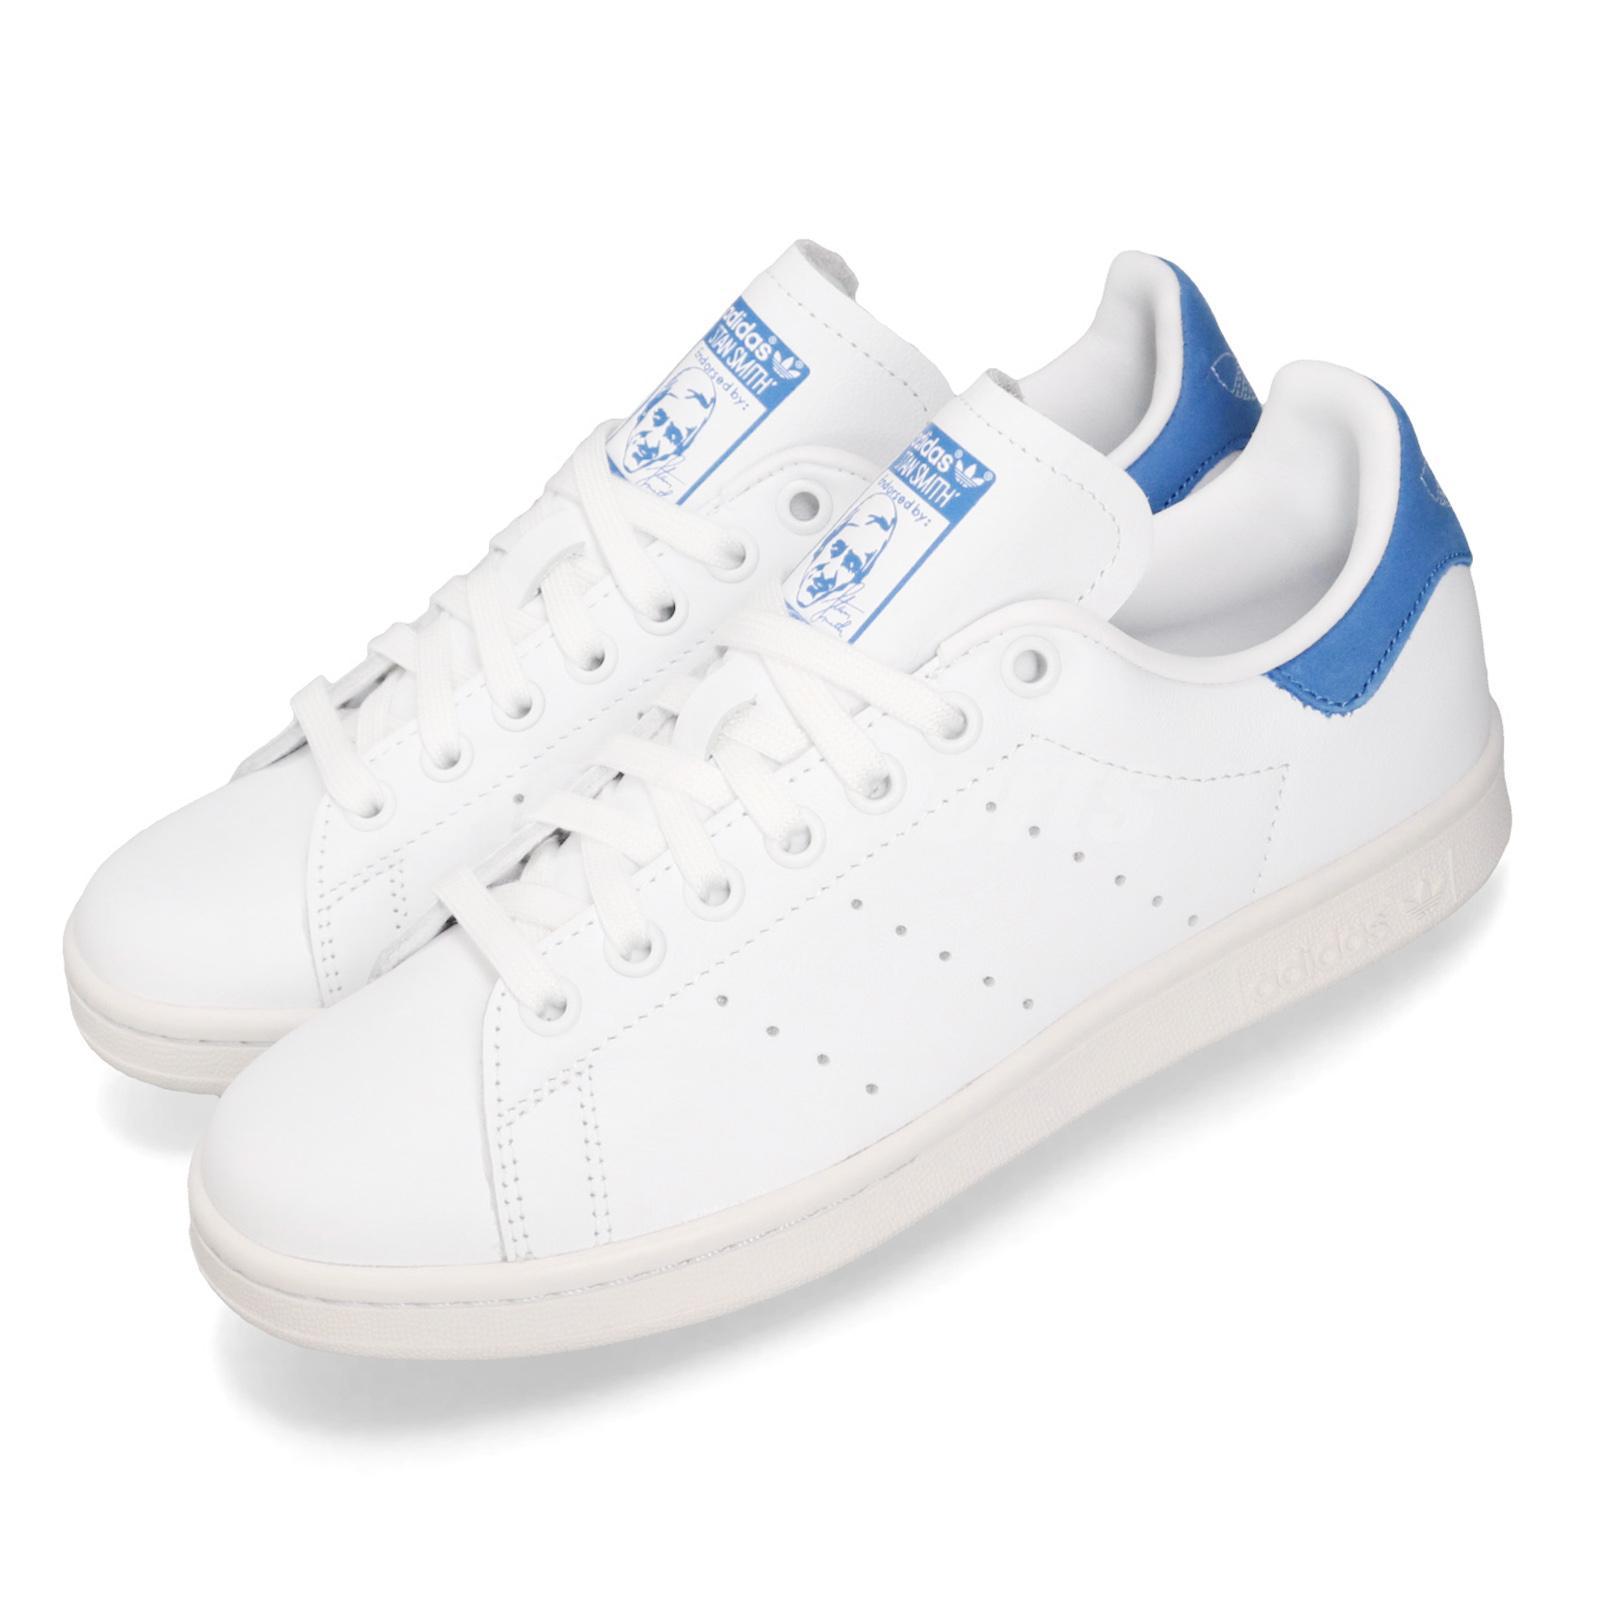 Adidas Originals Stan Smith CF Straps Men Classic Shoe Sneaker Size 7